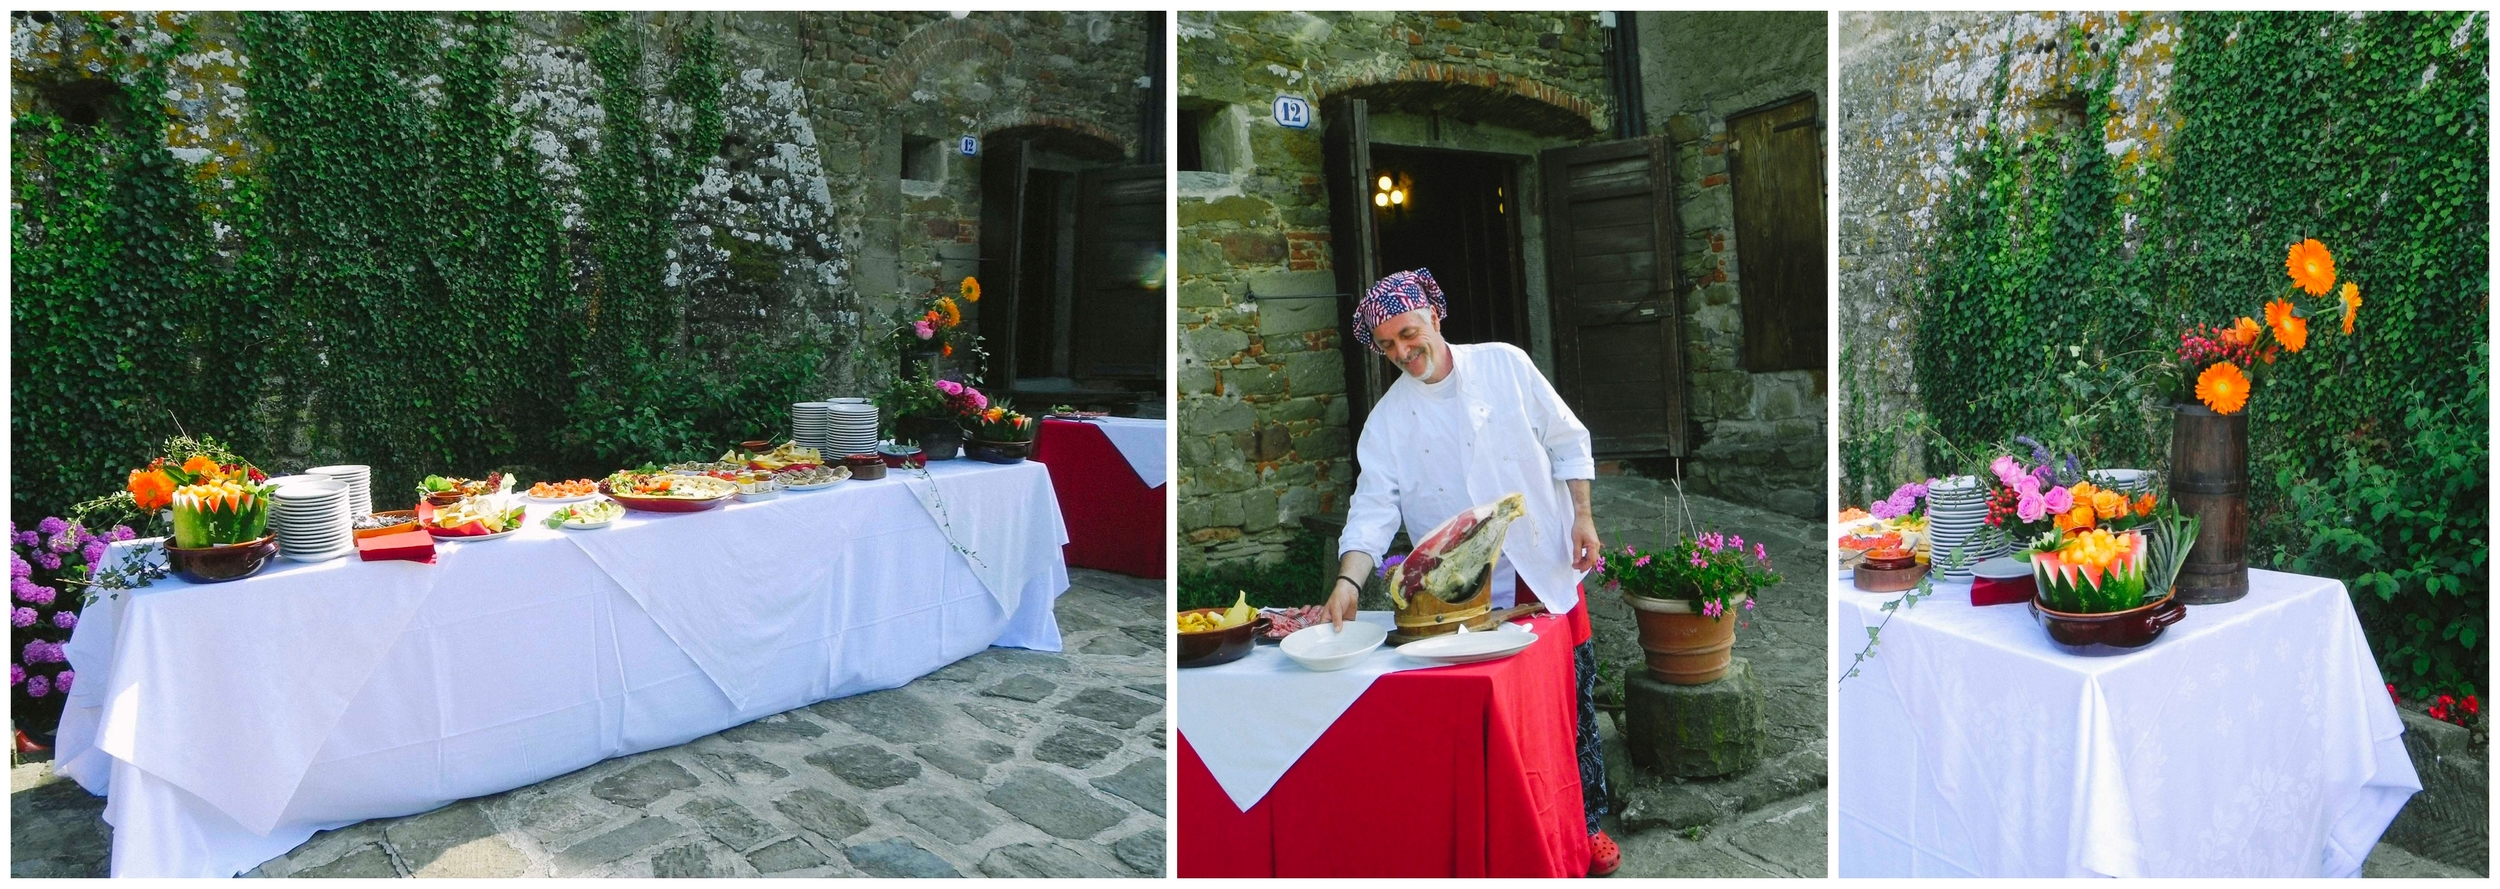 tuscany_wedding-09.jpg